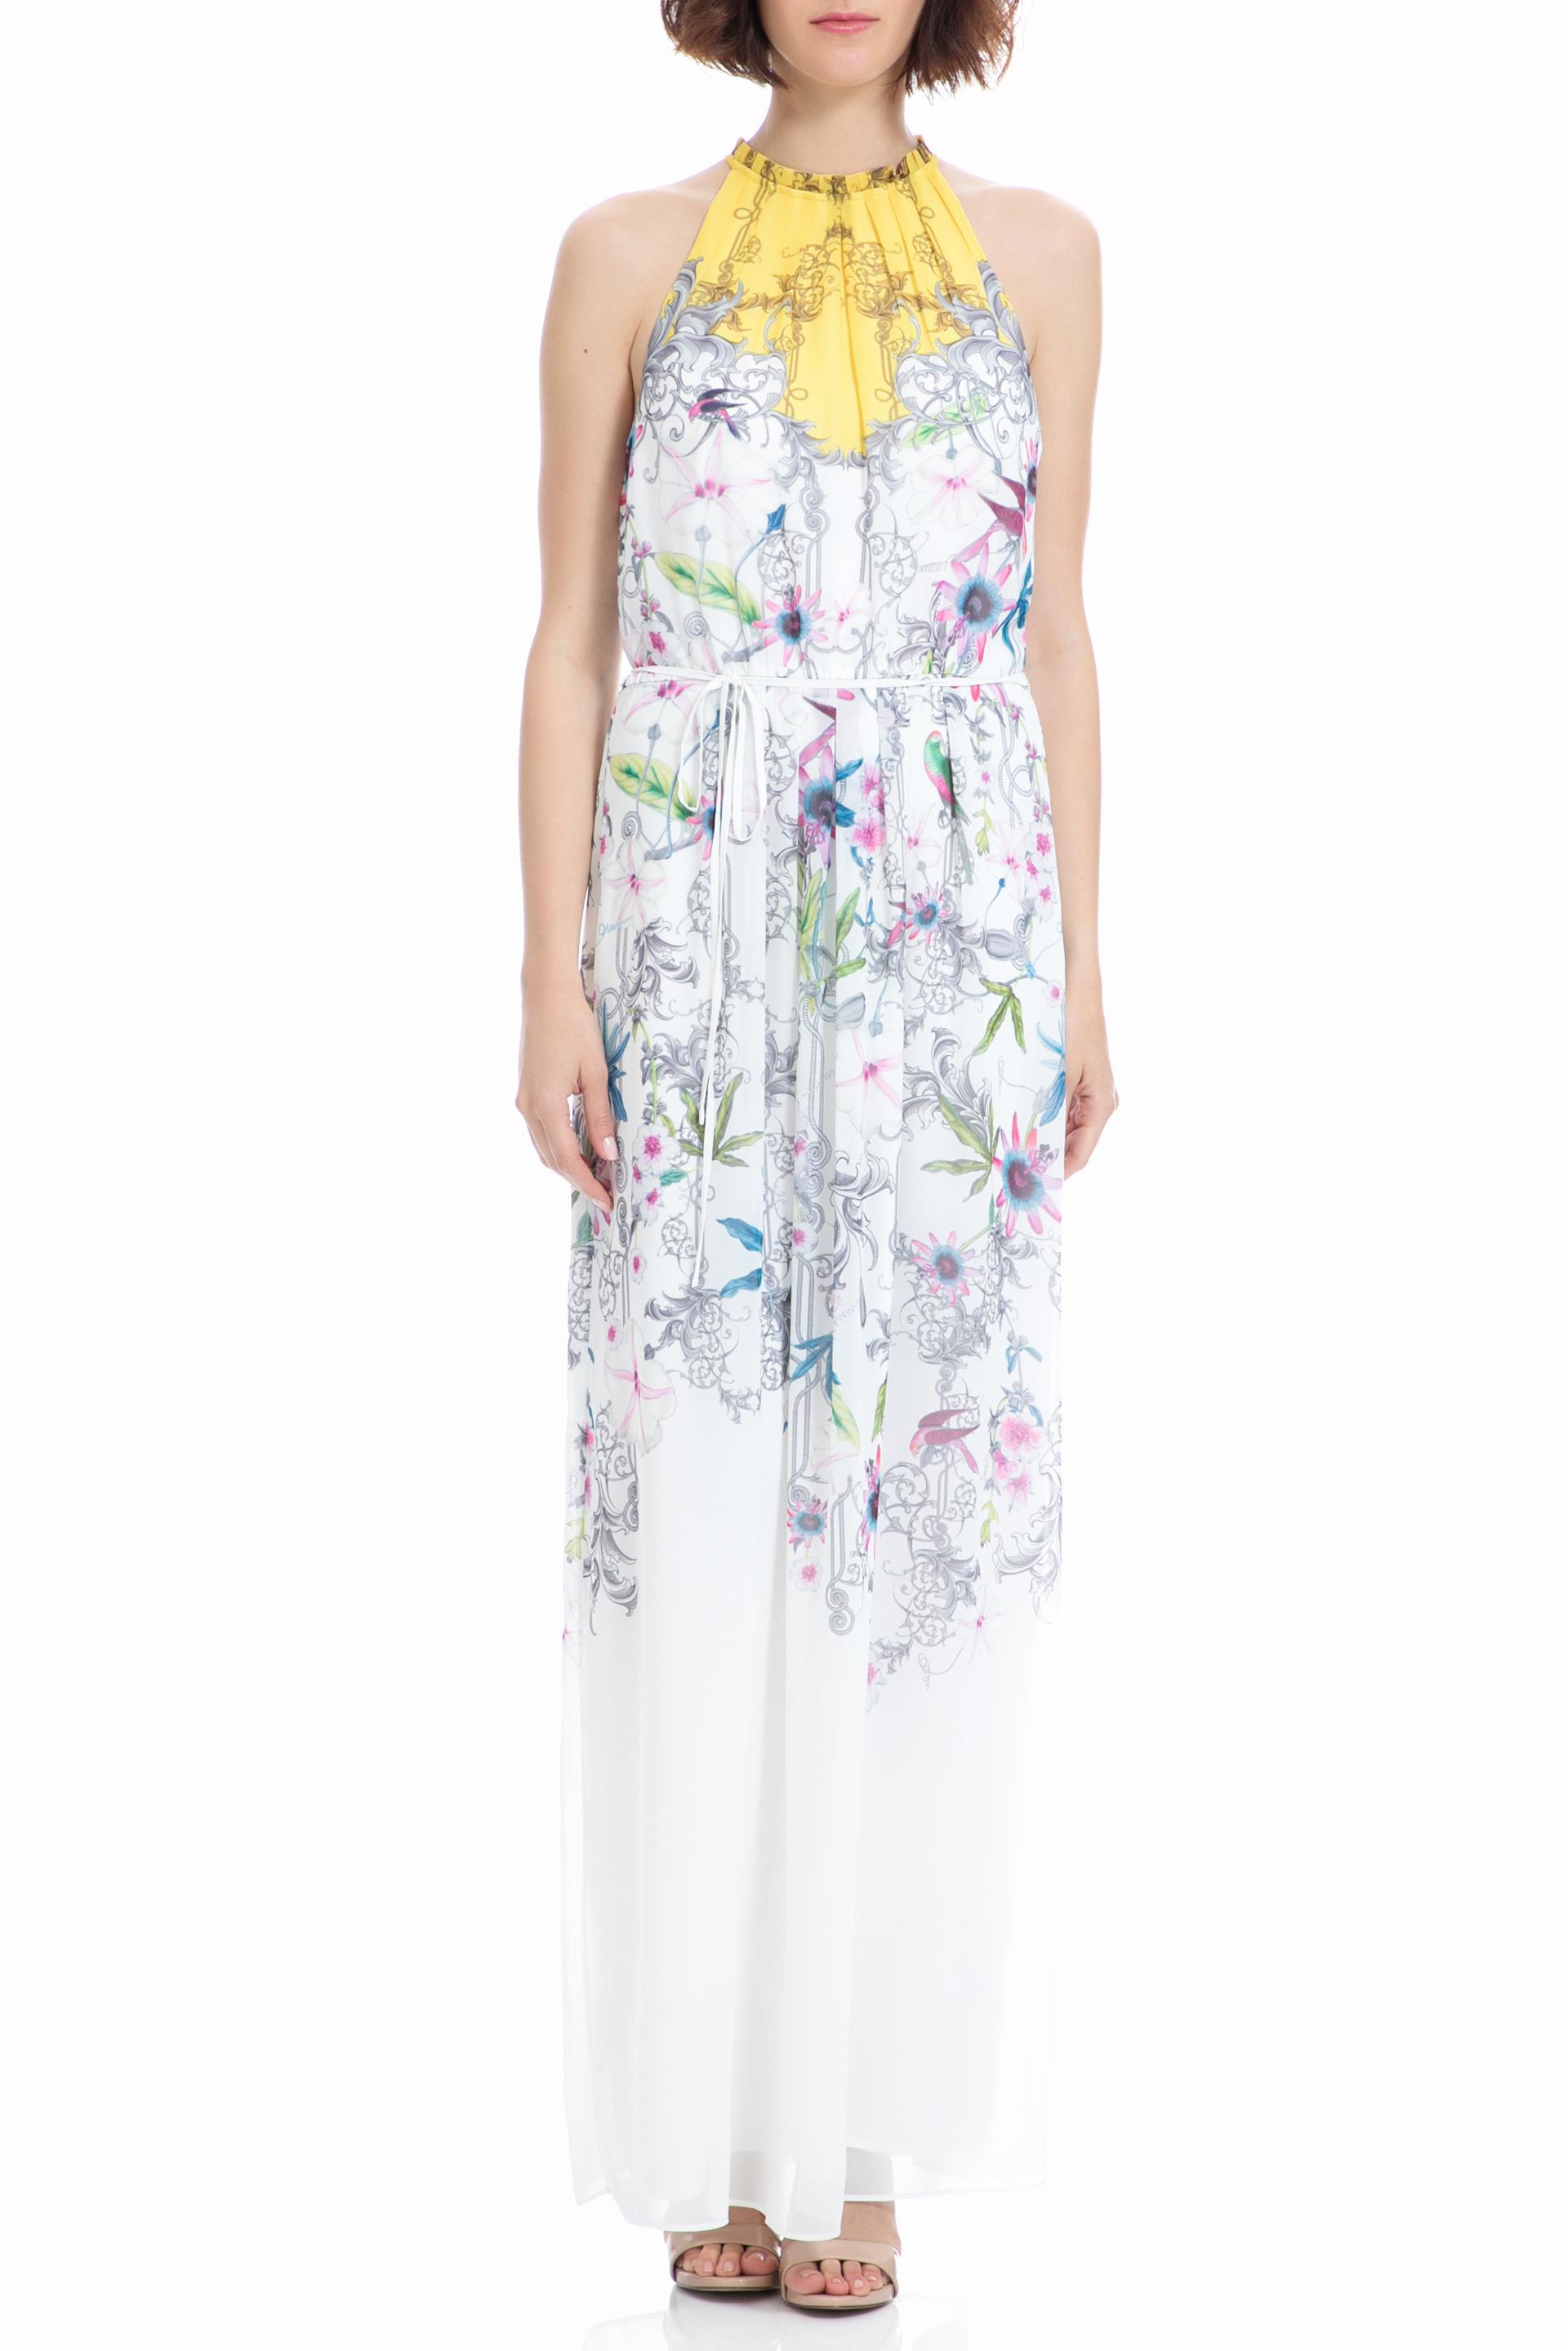 TED BAKER - Μάξι φόρεμα TED BAKER λευκό γυναικεία ρούχα φορέματα μάξι